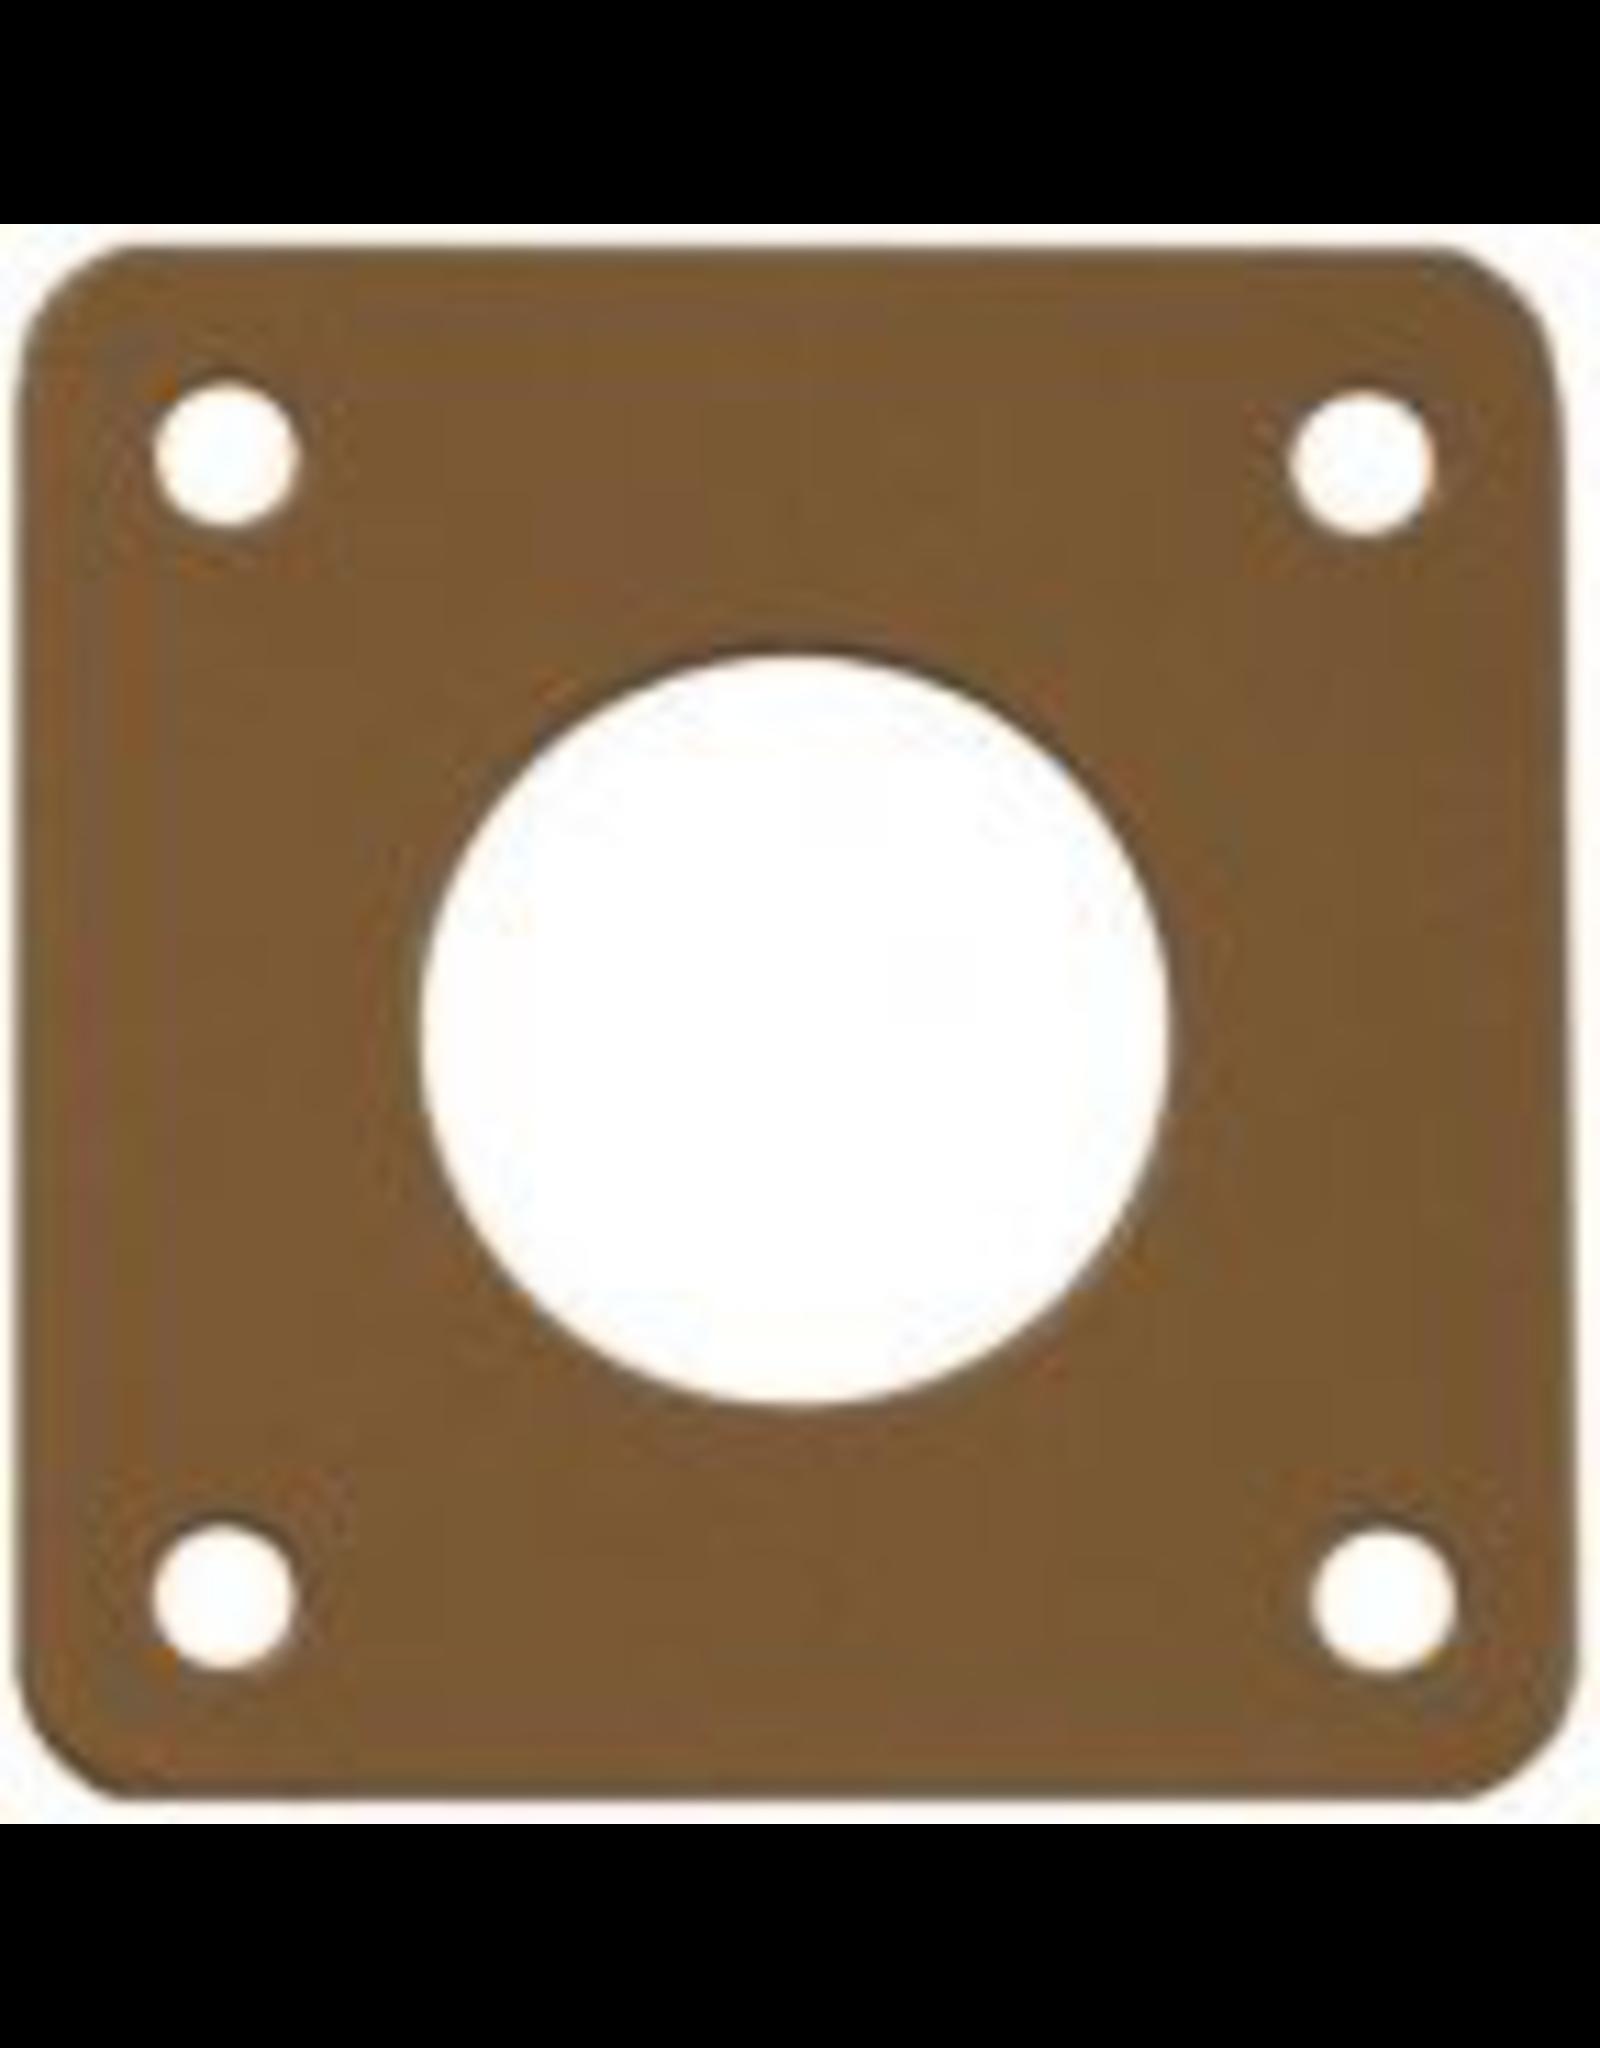 "Erva ETPH4T 1"" Hole Protector-Tan"